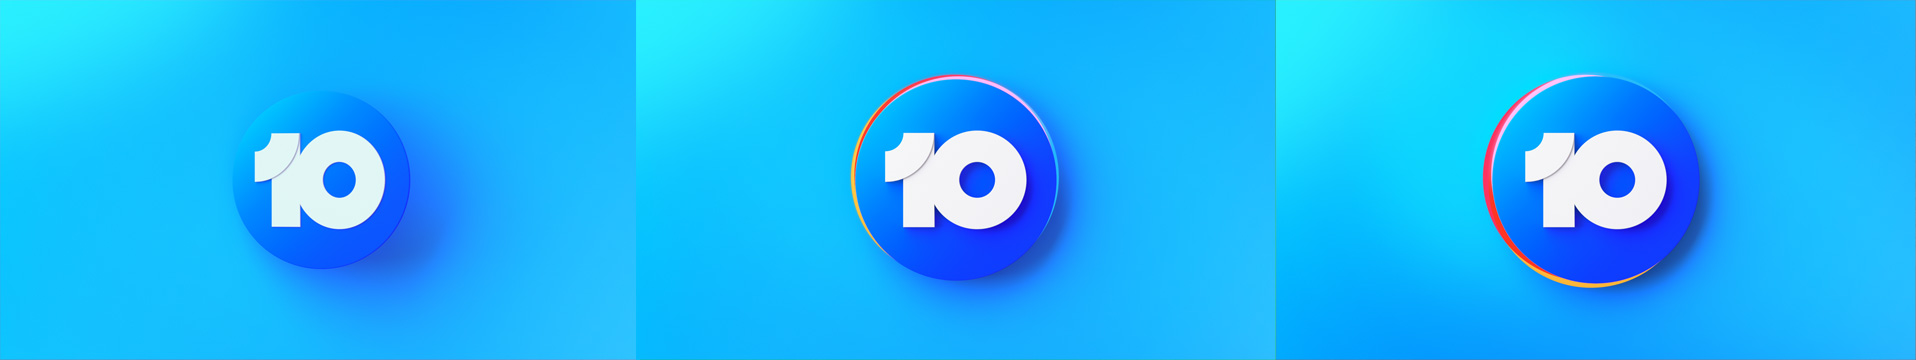 Network 10 Logo